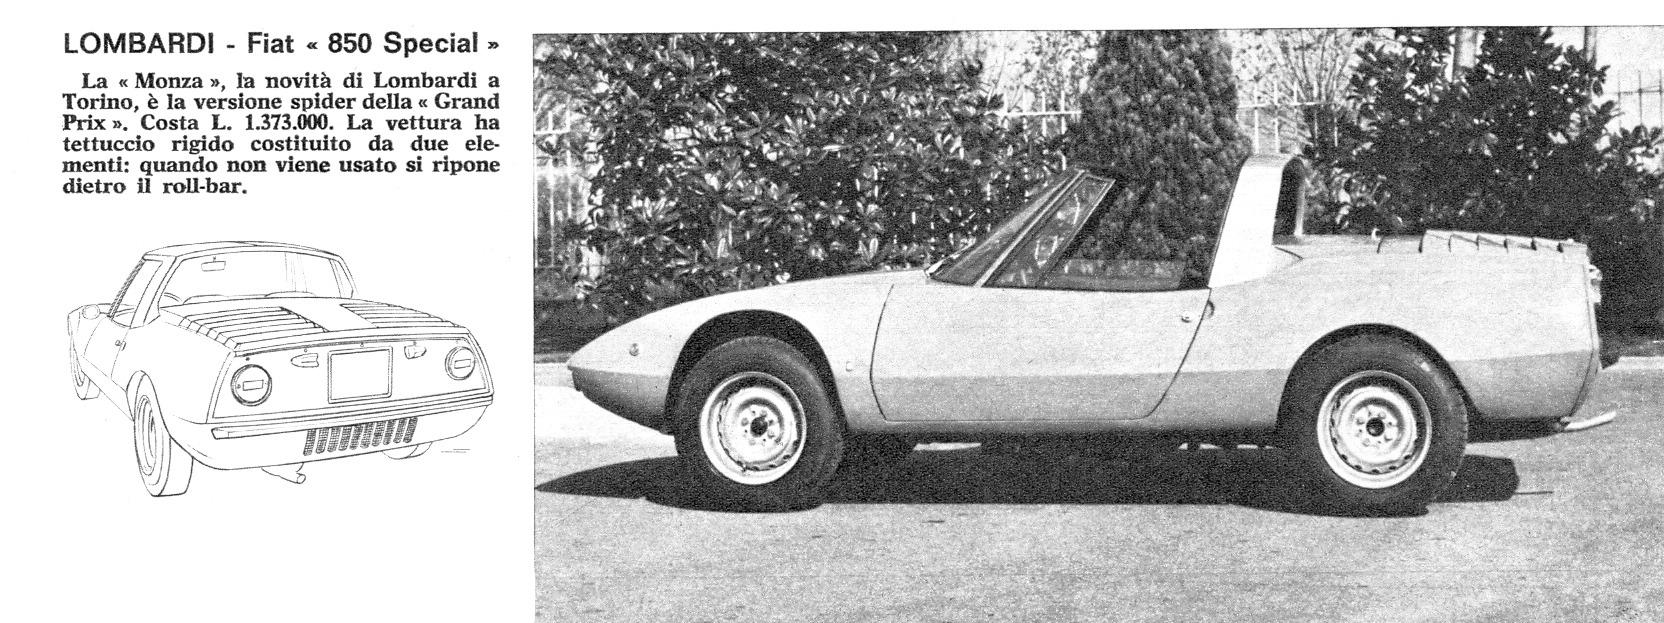 1969-Francis-Lombardi-Fiat-850-Monza-02